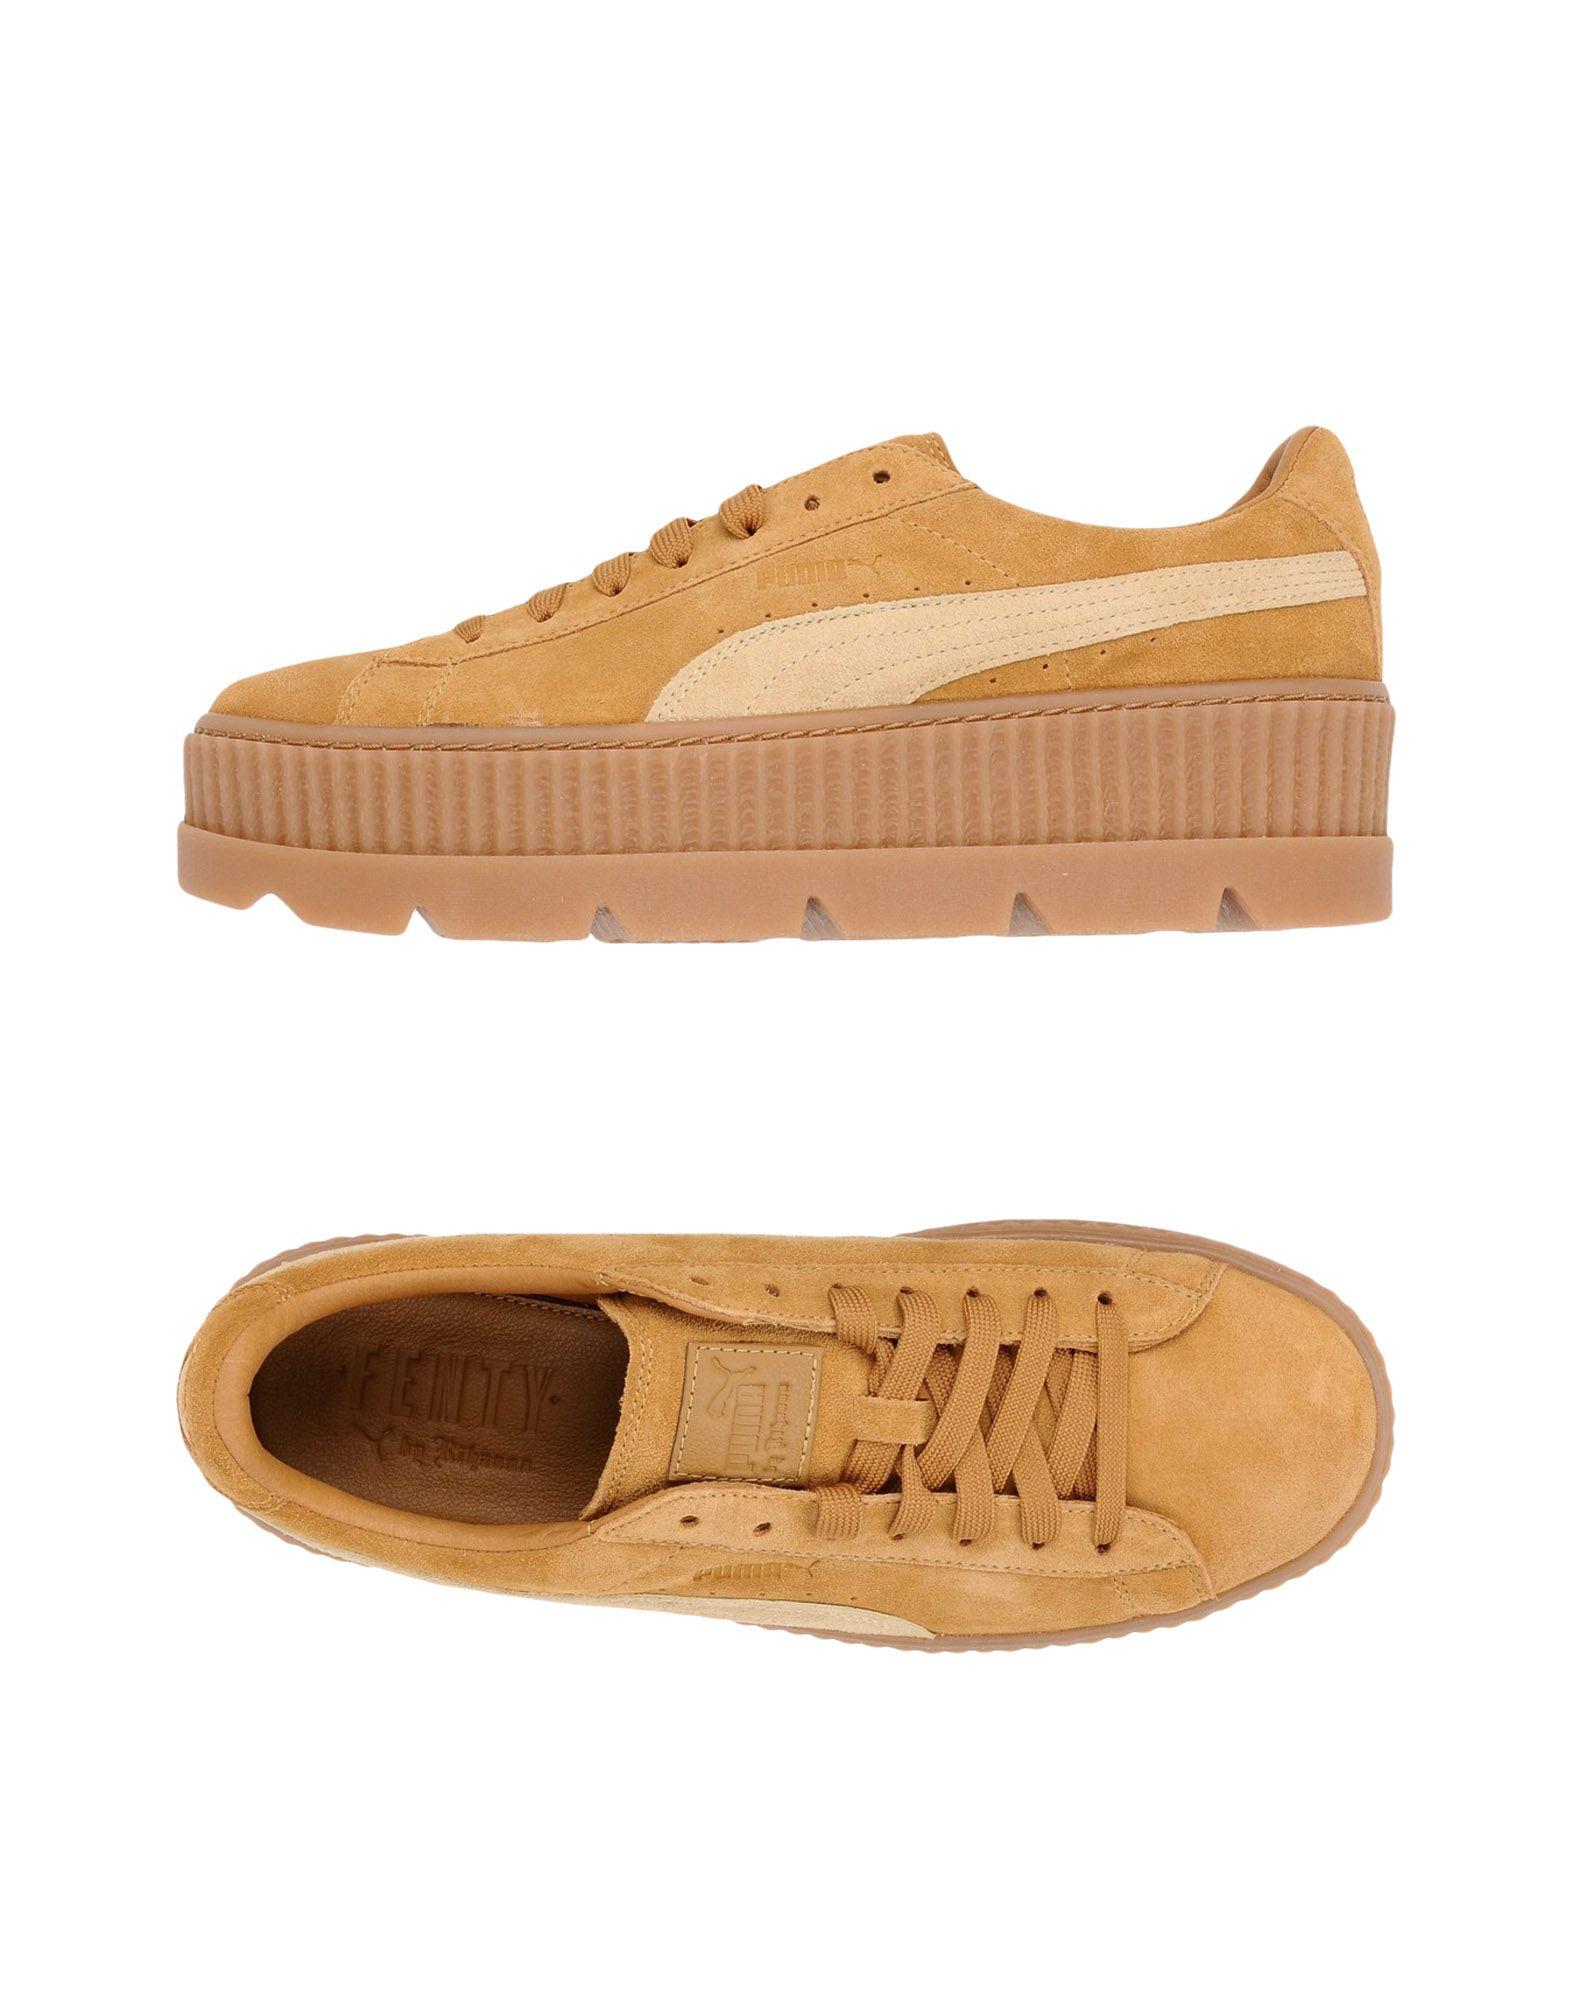 By Homme Cleated Suede Fenty Puma Rihanna Creeper Sneakers I6gyYfbv7